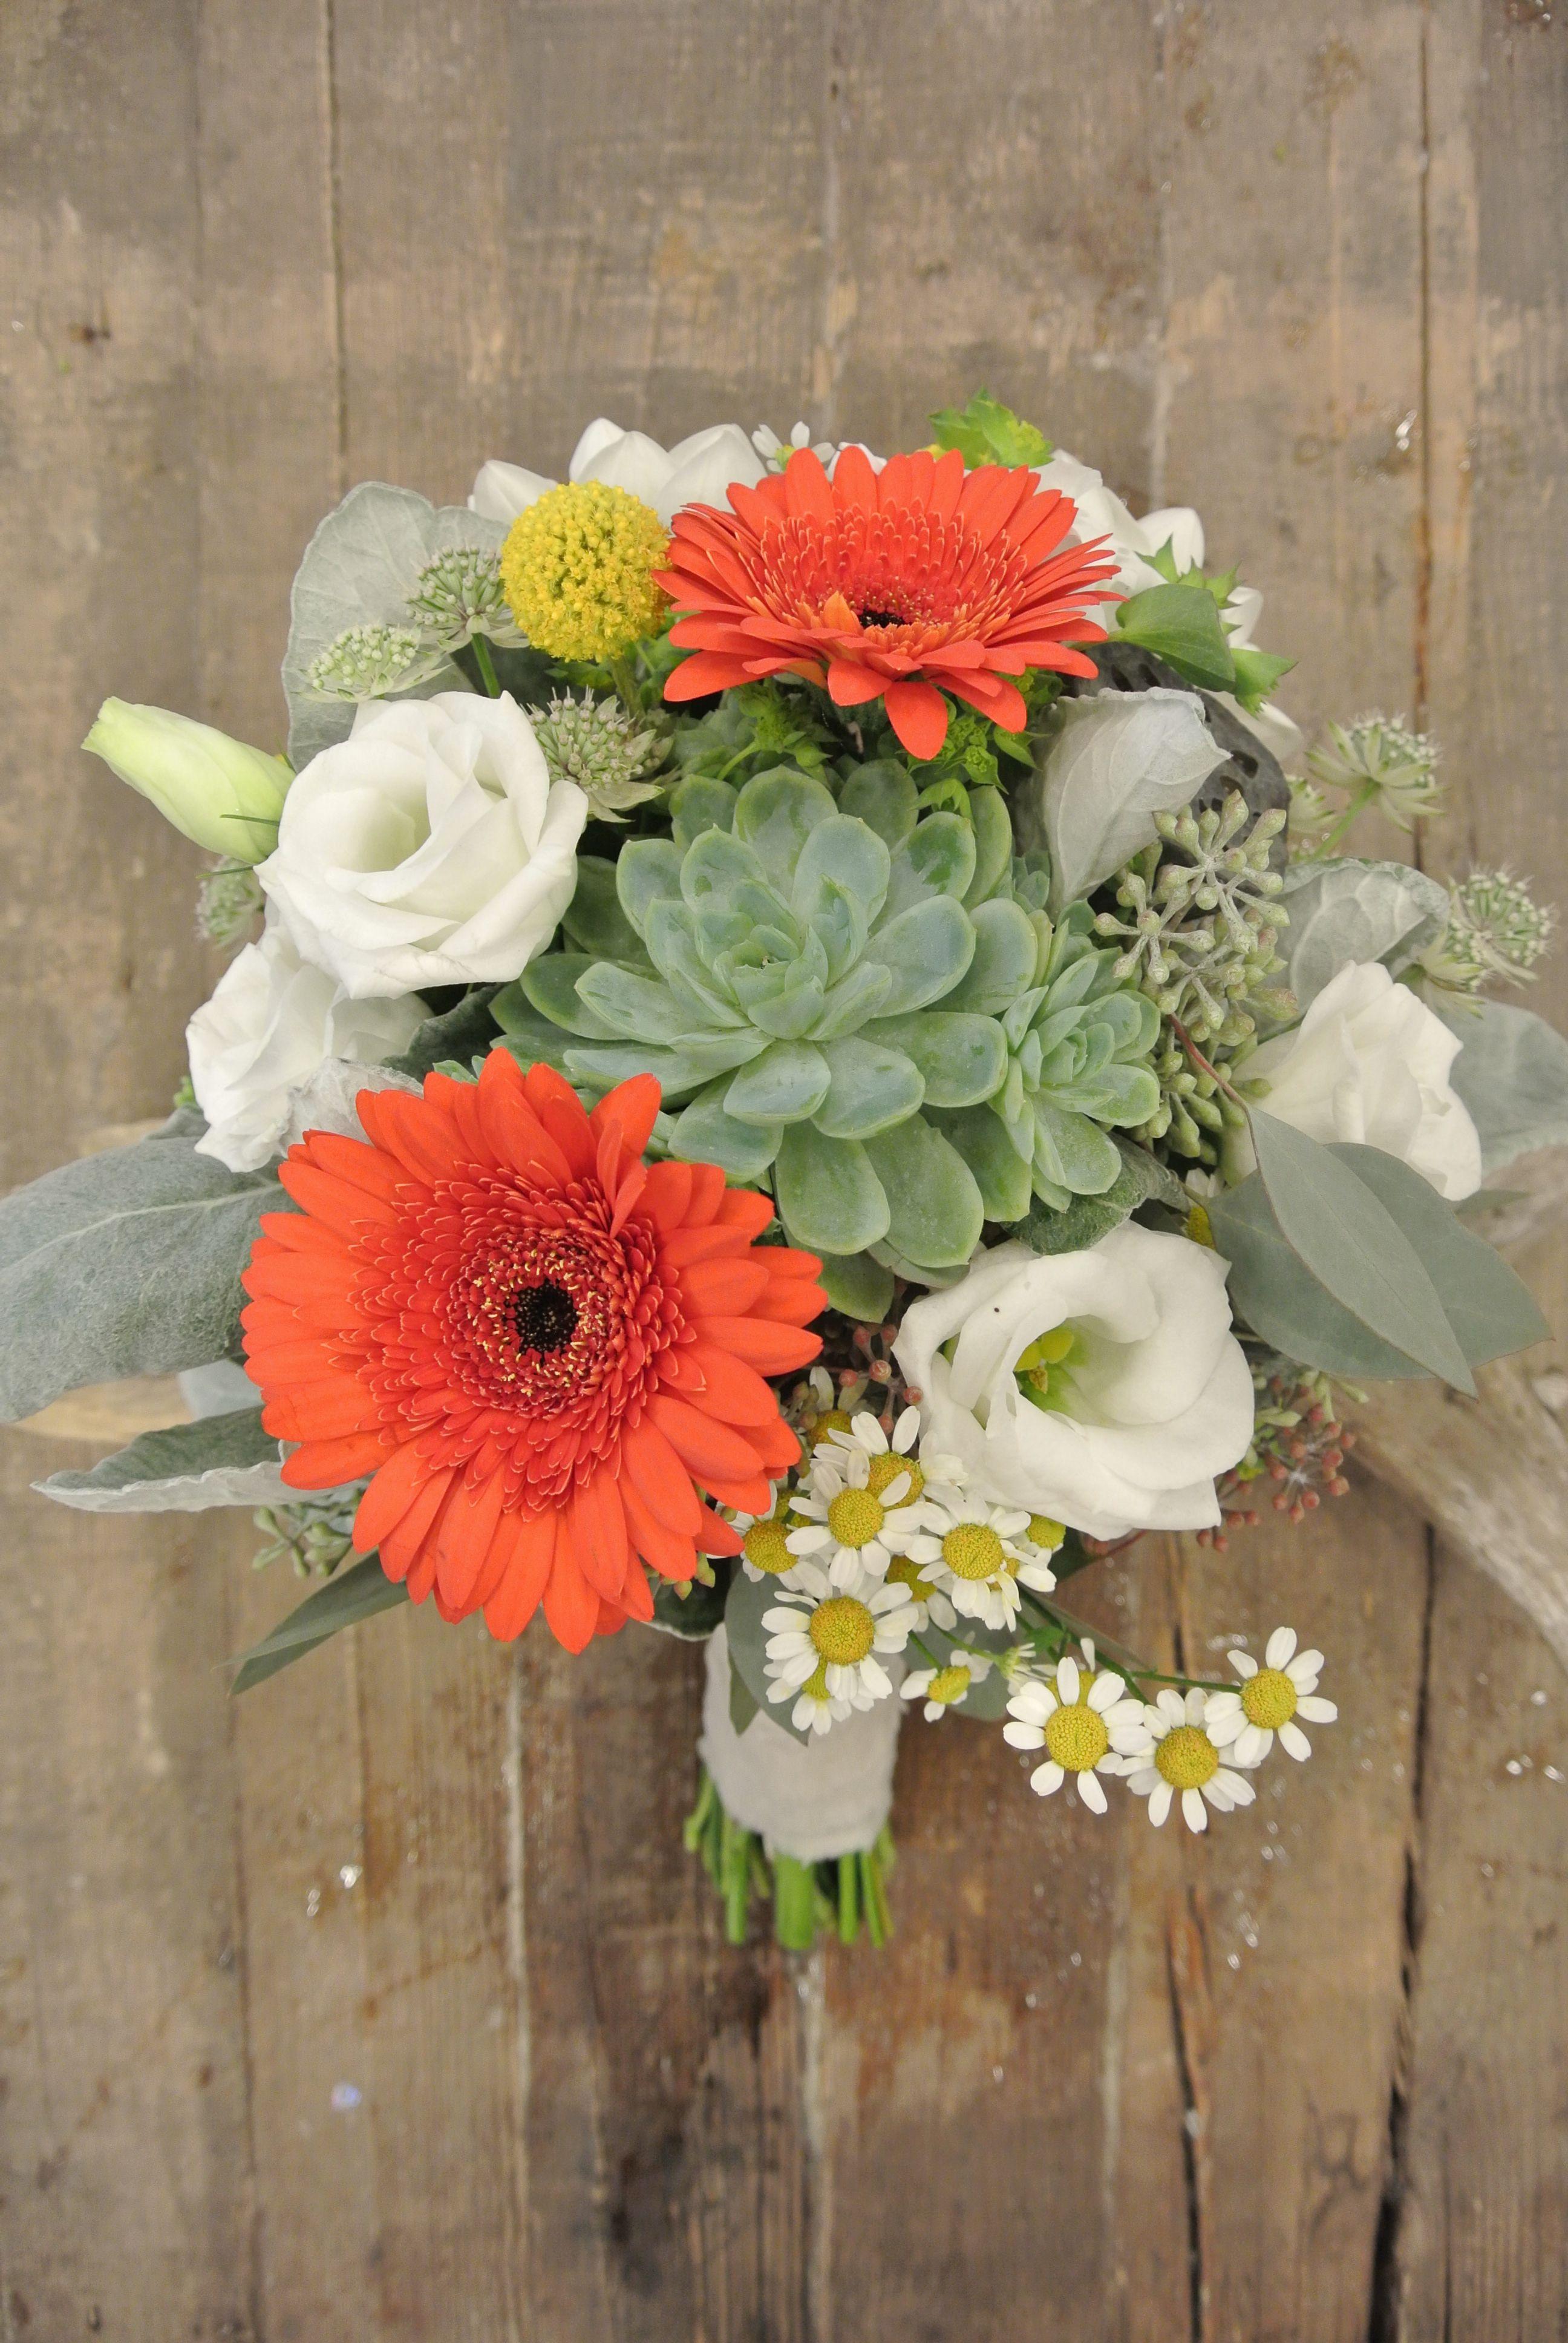 Bridal Bouquet Dahlias, Scabiosa, Succulents, Craspedia, Matricaria and Mini Gerberas